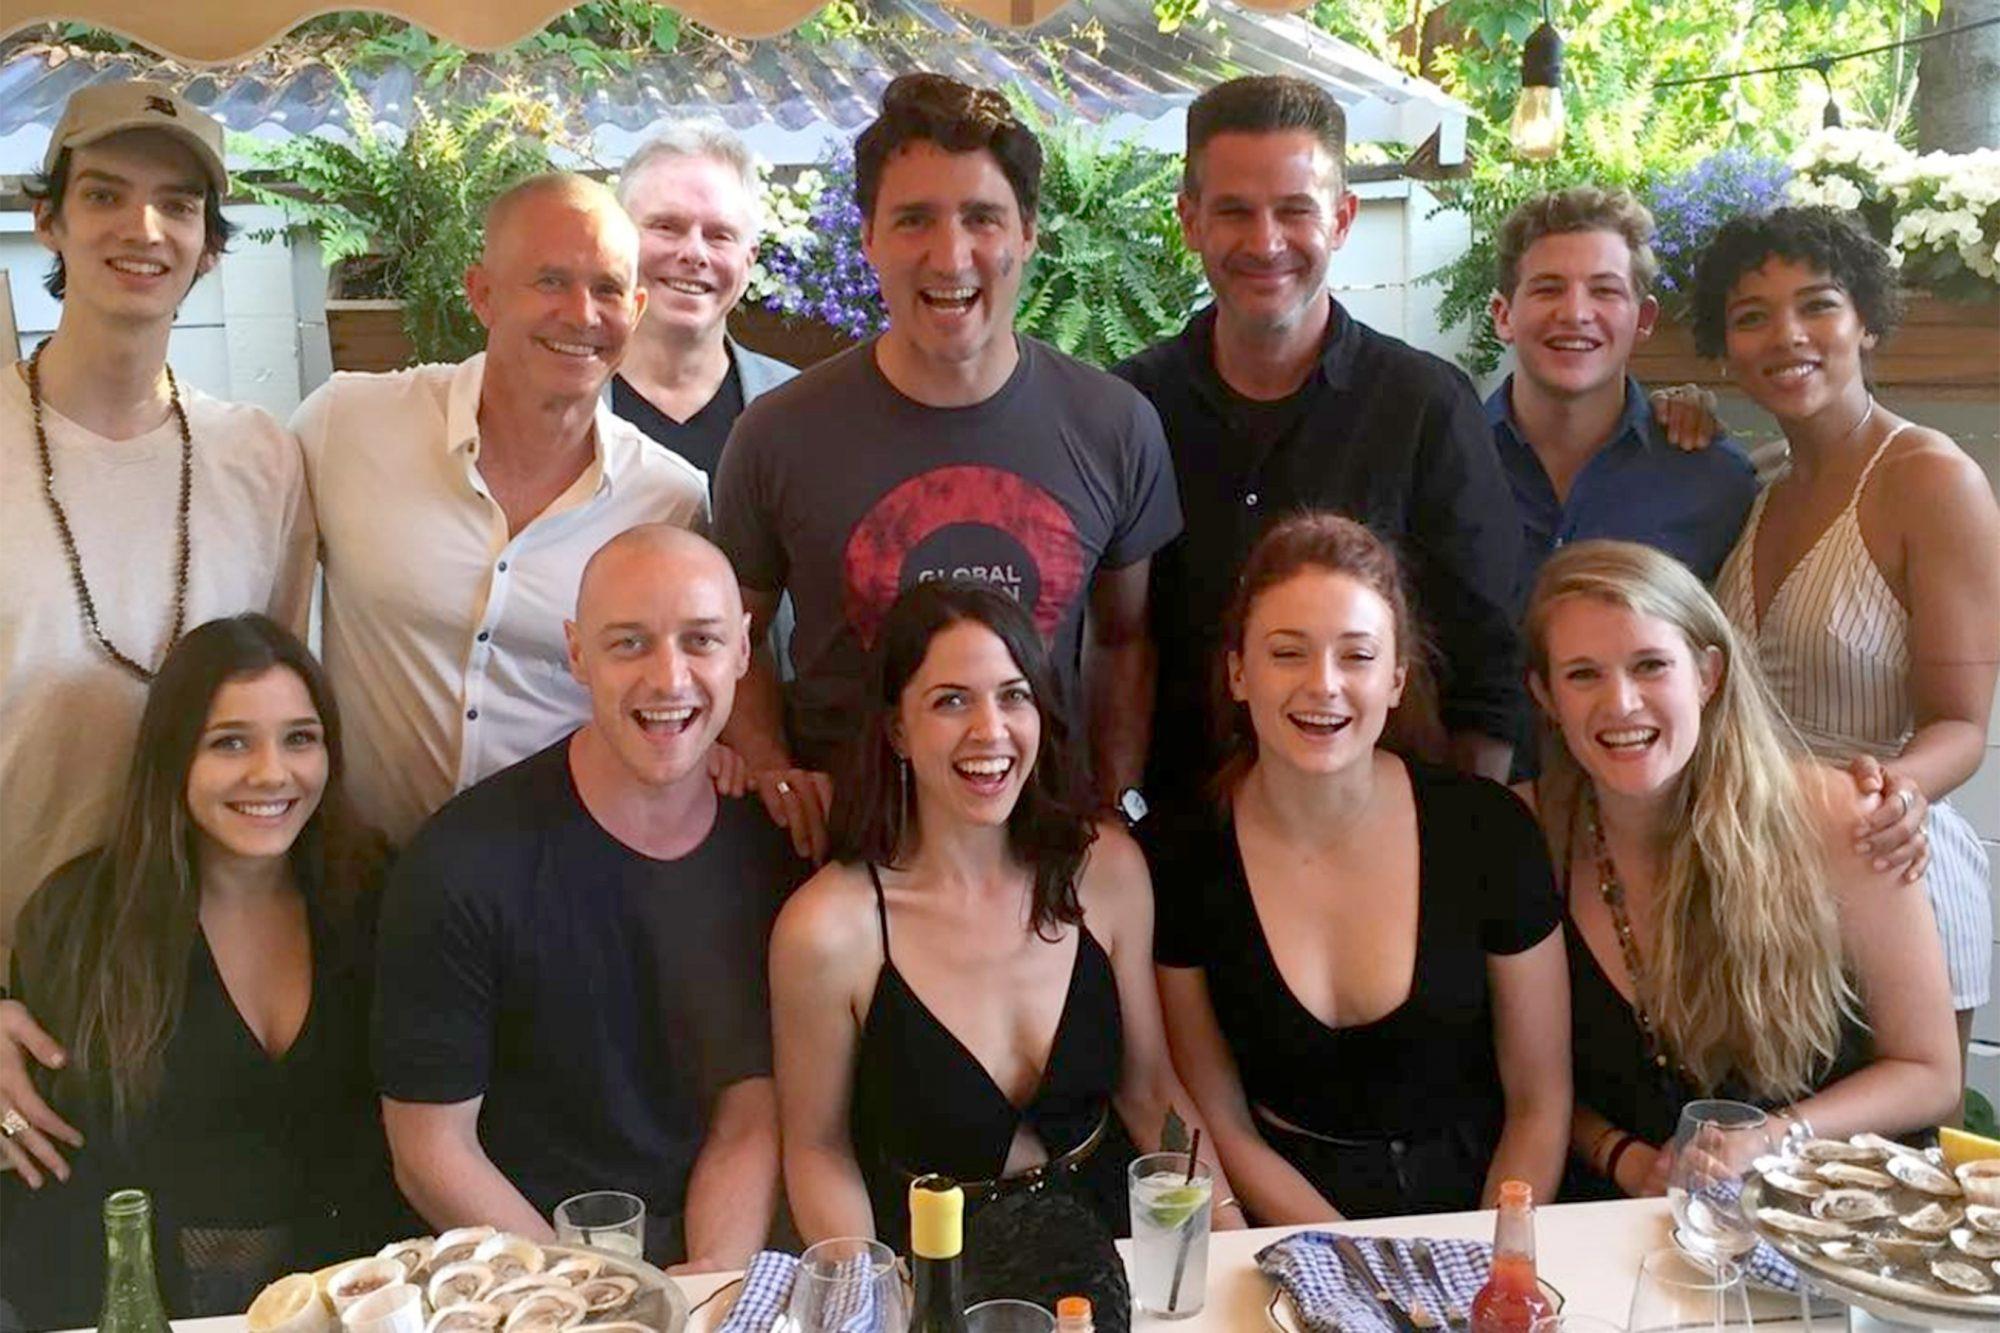 Justin Trudeau hangs with X-Men cast